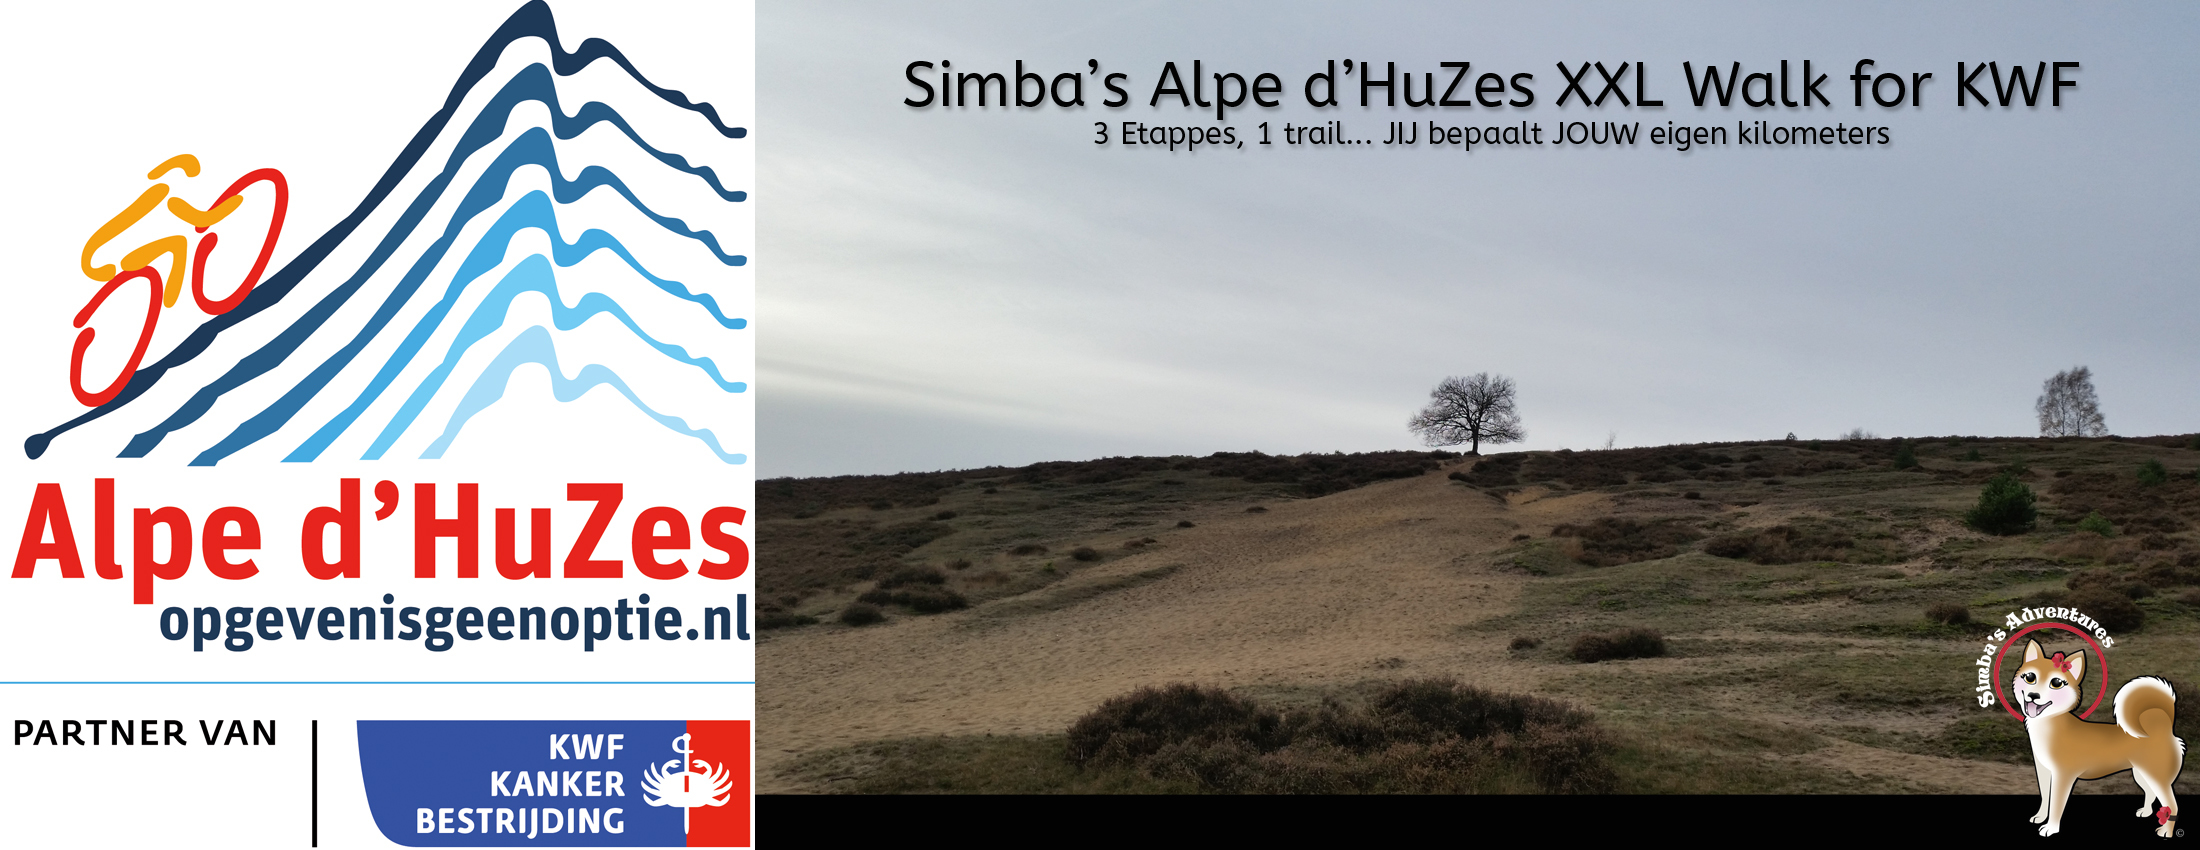 Simba's Alpe d'HuZes XXL Walk